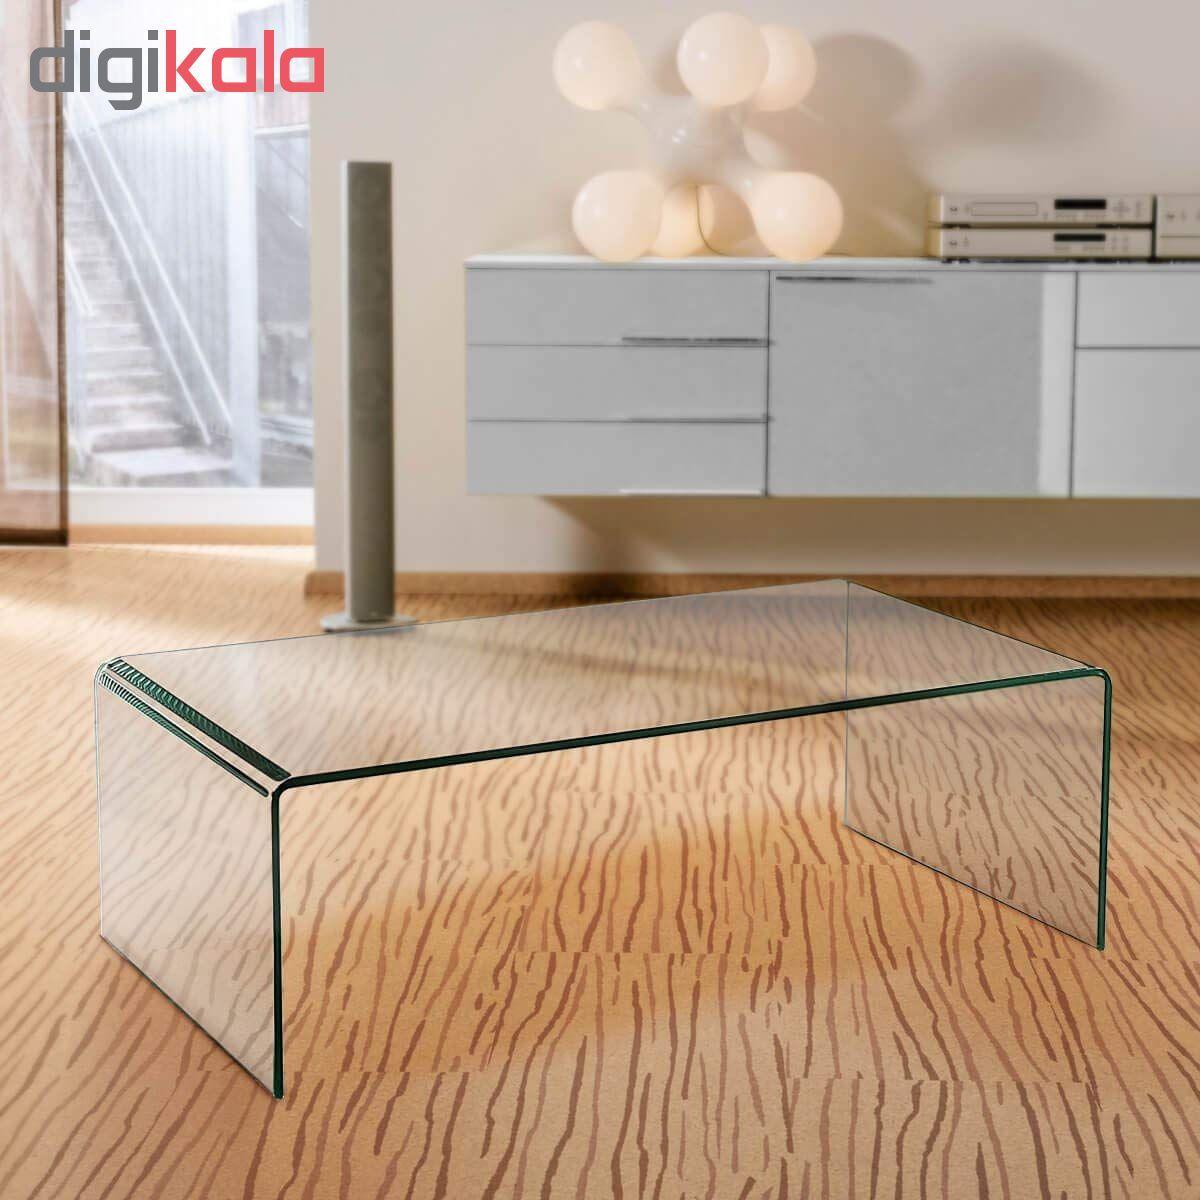 میز جلو مبلی شیشه خم اطلس 12 میل طول 110 سانتی متر main 1 2